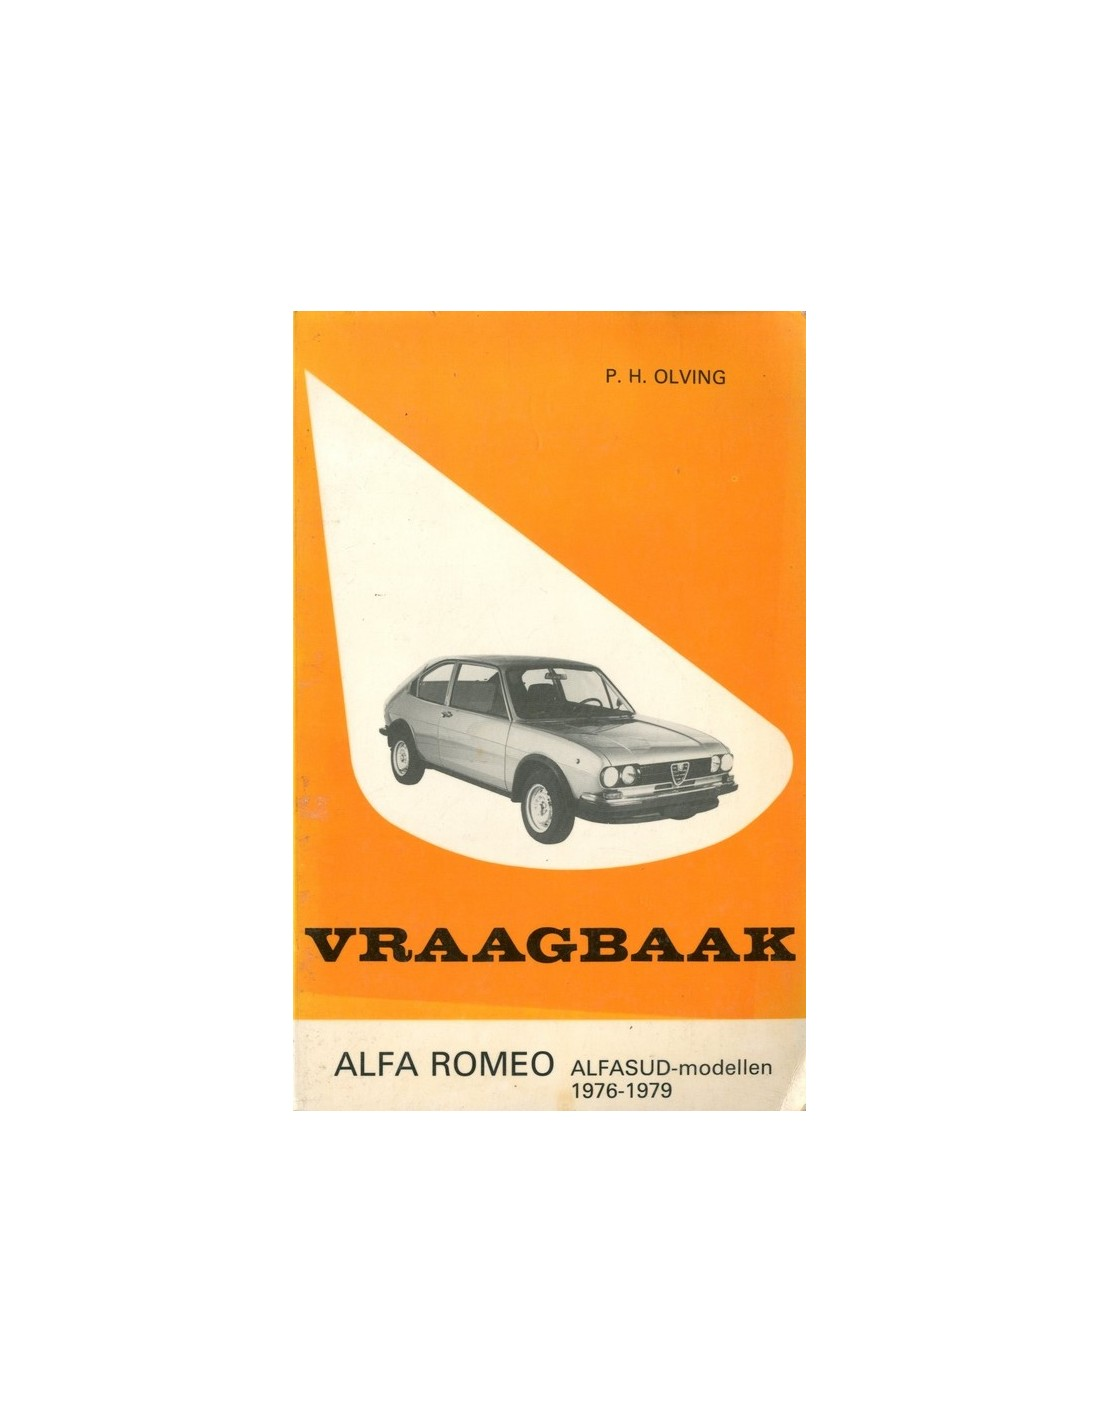 1979 ALFA ROMEO ALFASUD PETROL HANDBOOK DUTCH